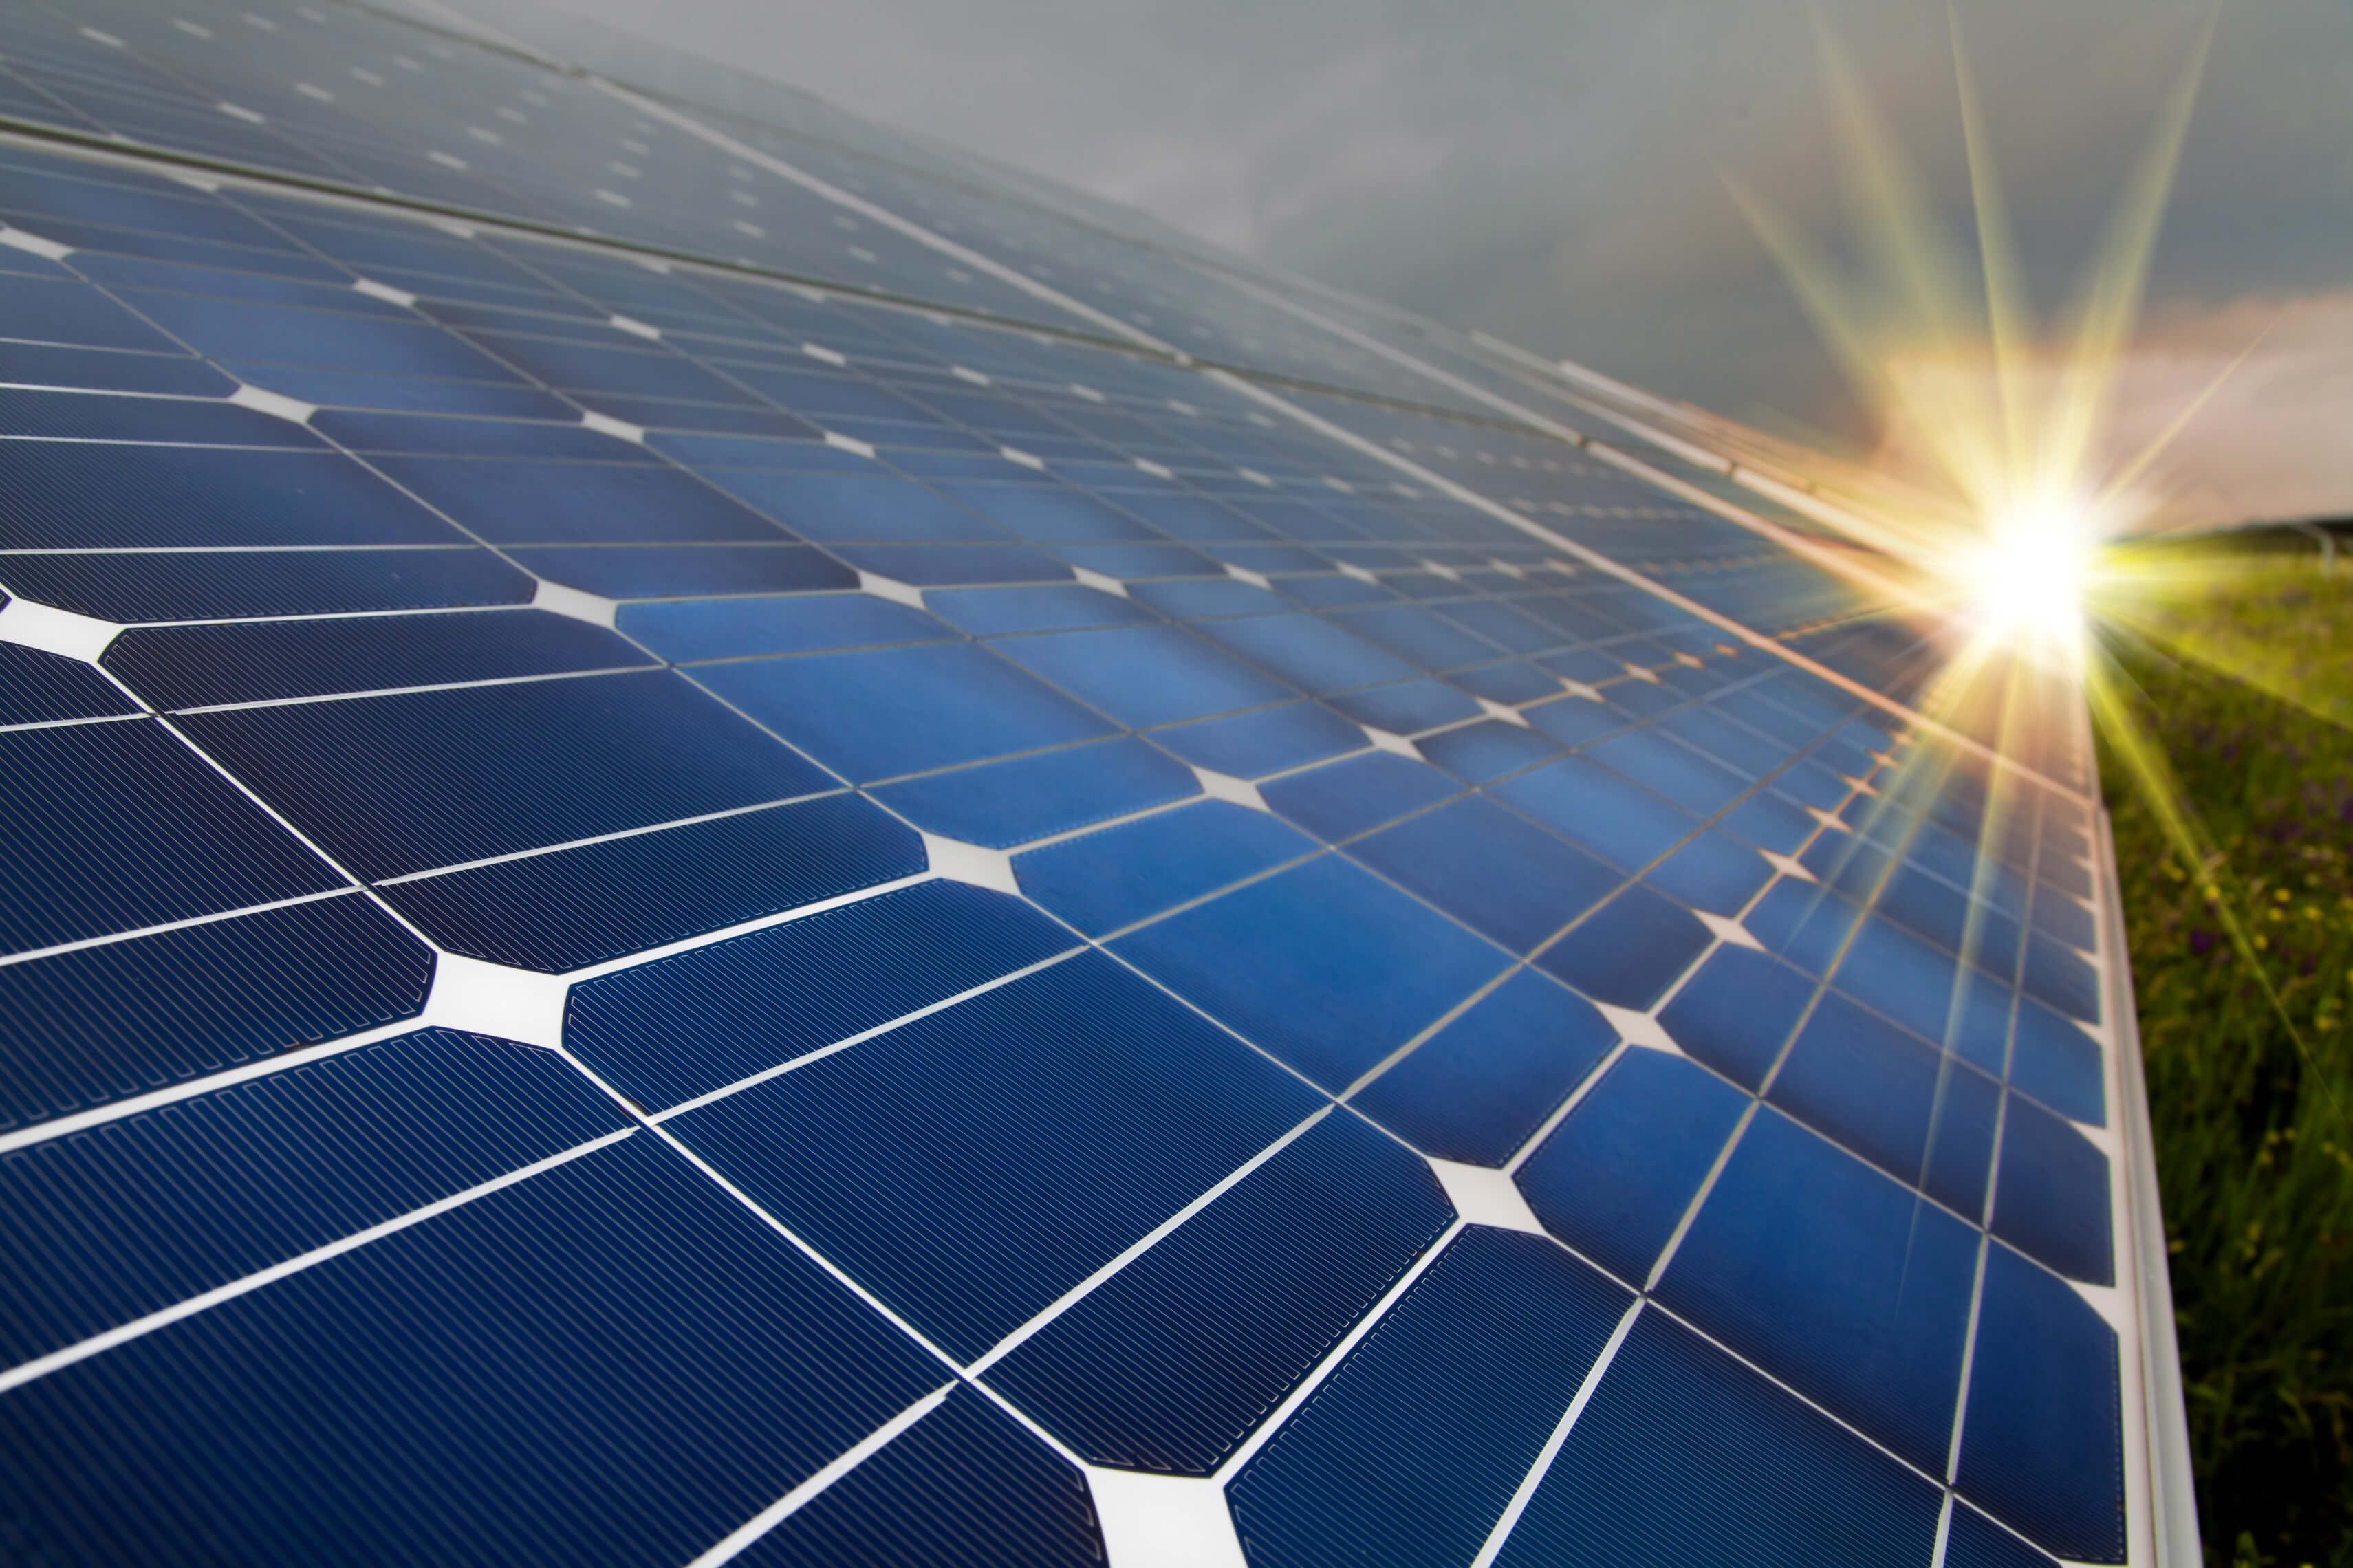 Photovoltaique ©Fotolia